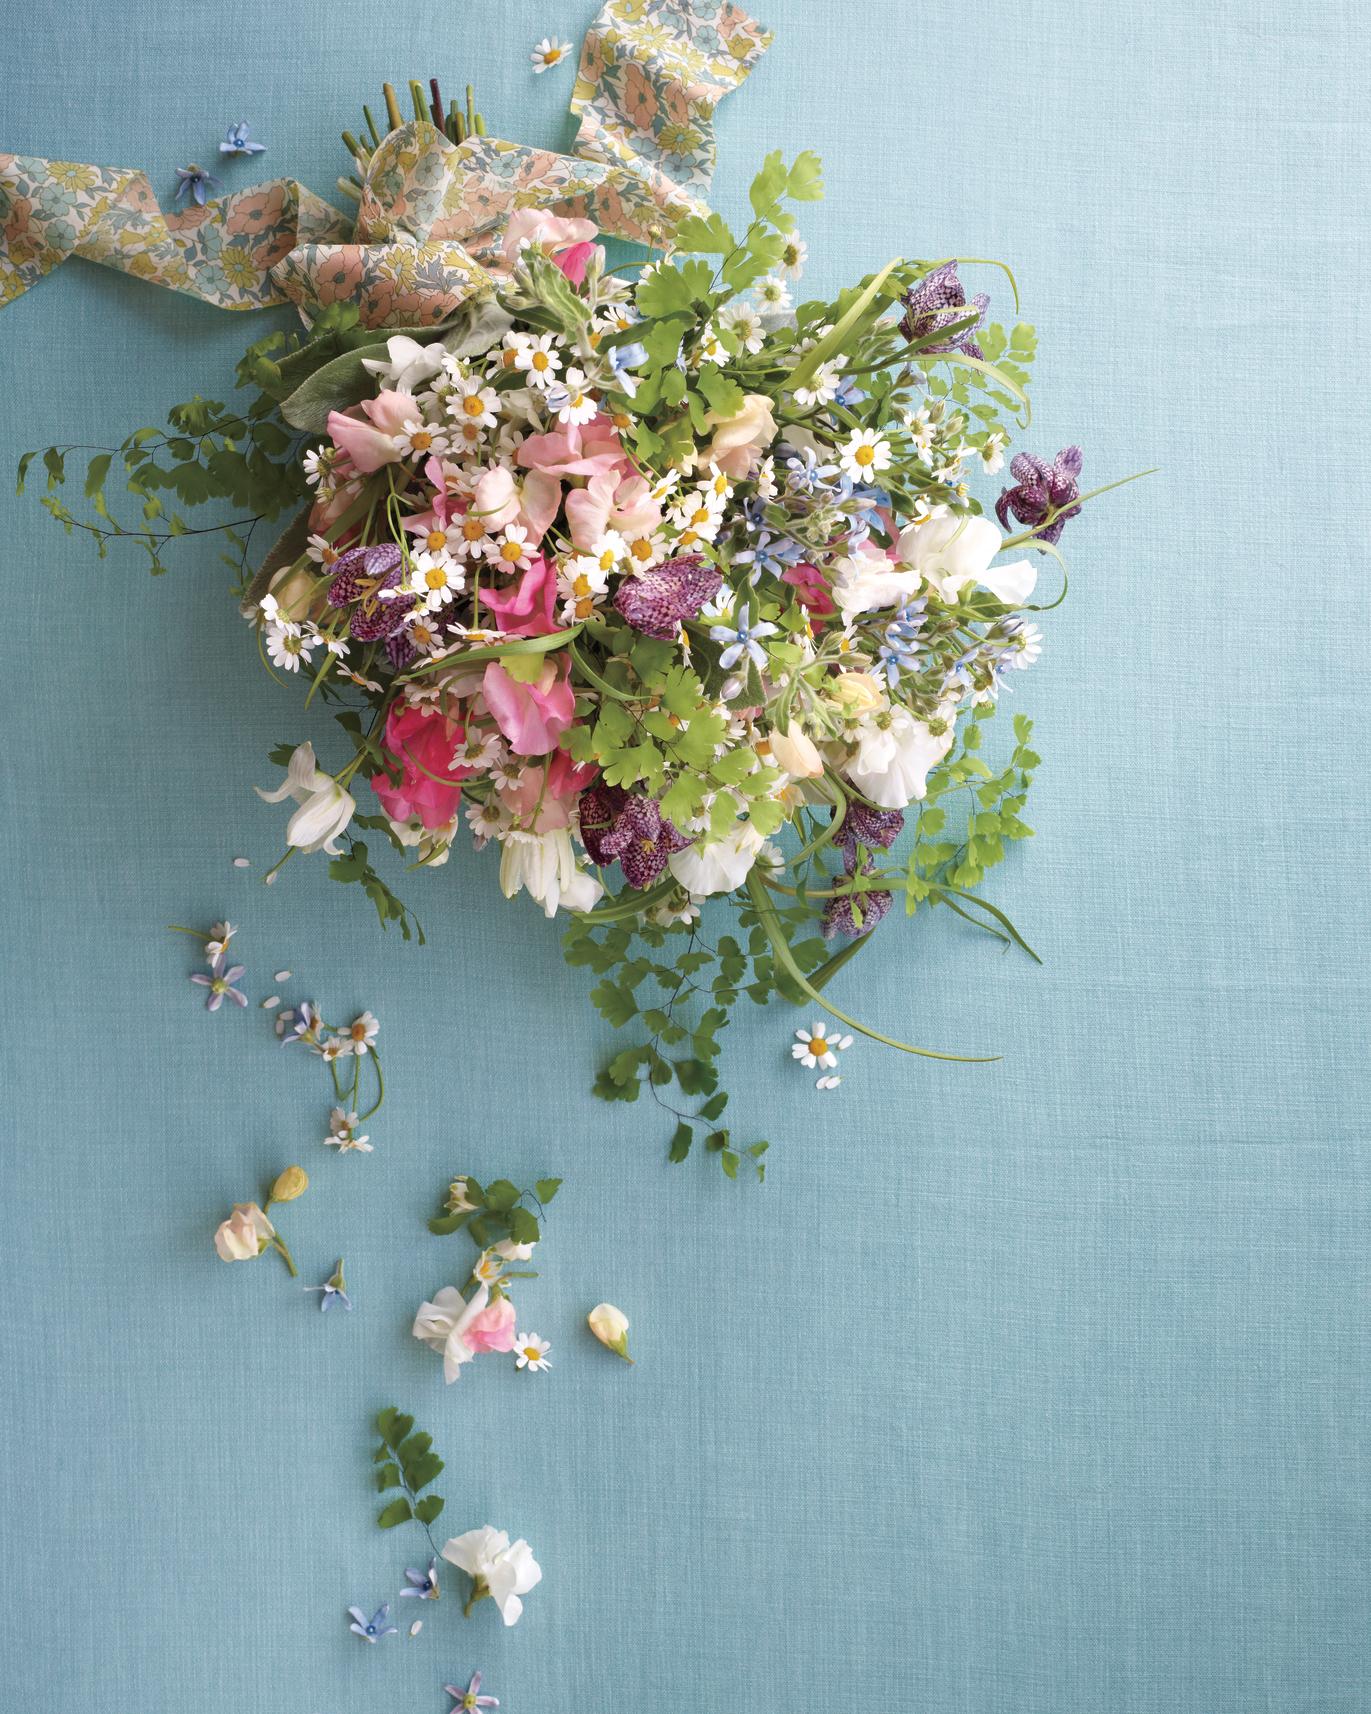 fabric-flowers-libertyb8-md108763.jpg